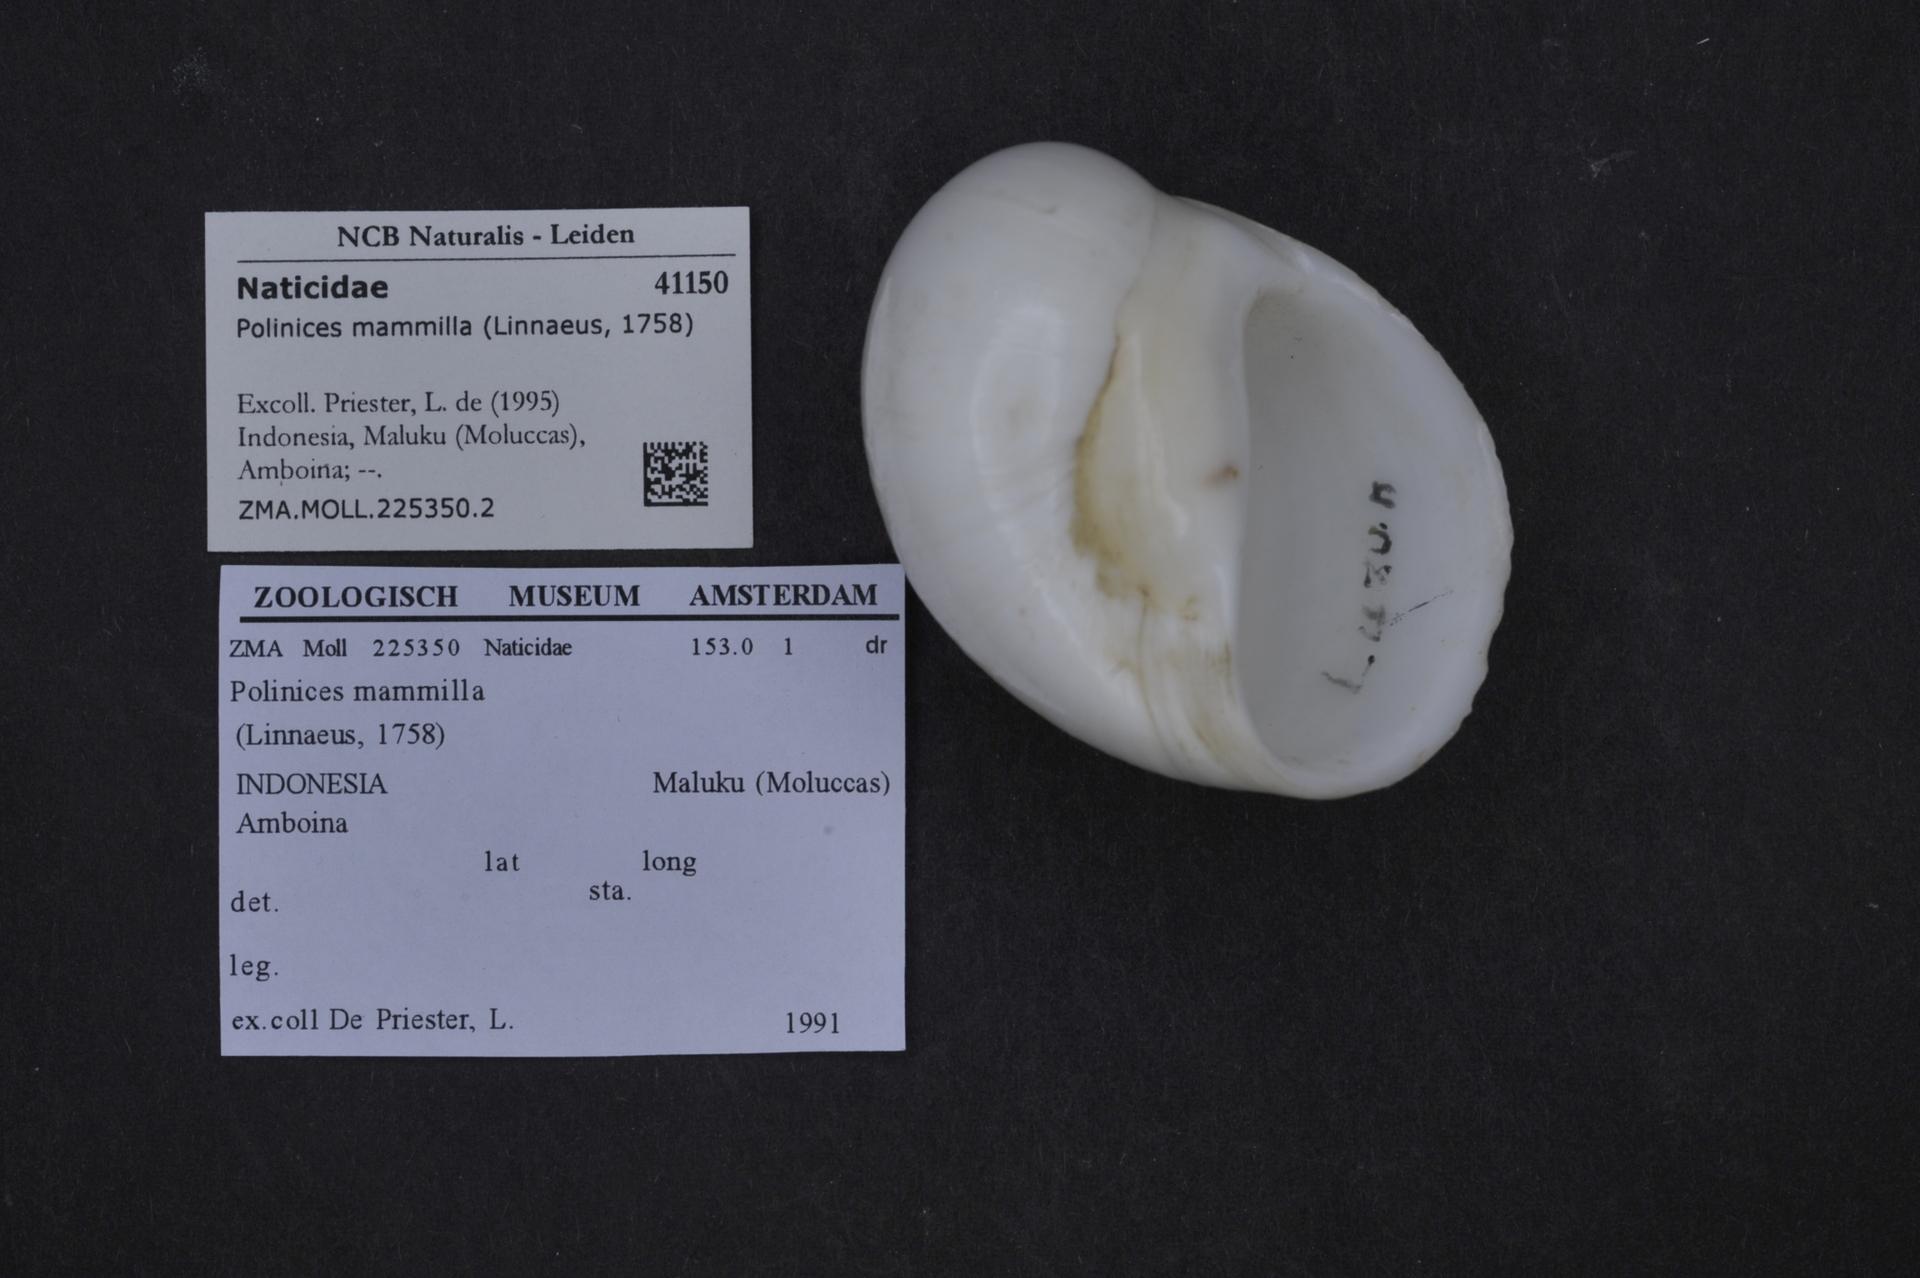 ZMA.MOLL.225350.2 | Polinices mammilla (Linnaeus, 1758)